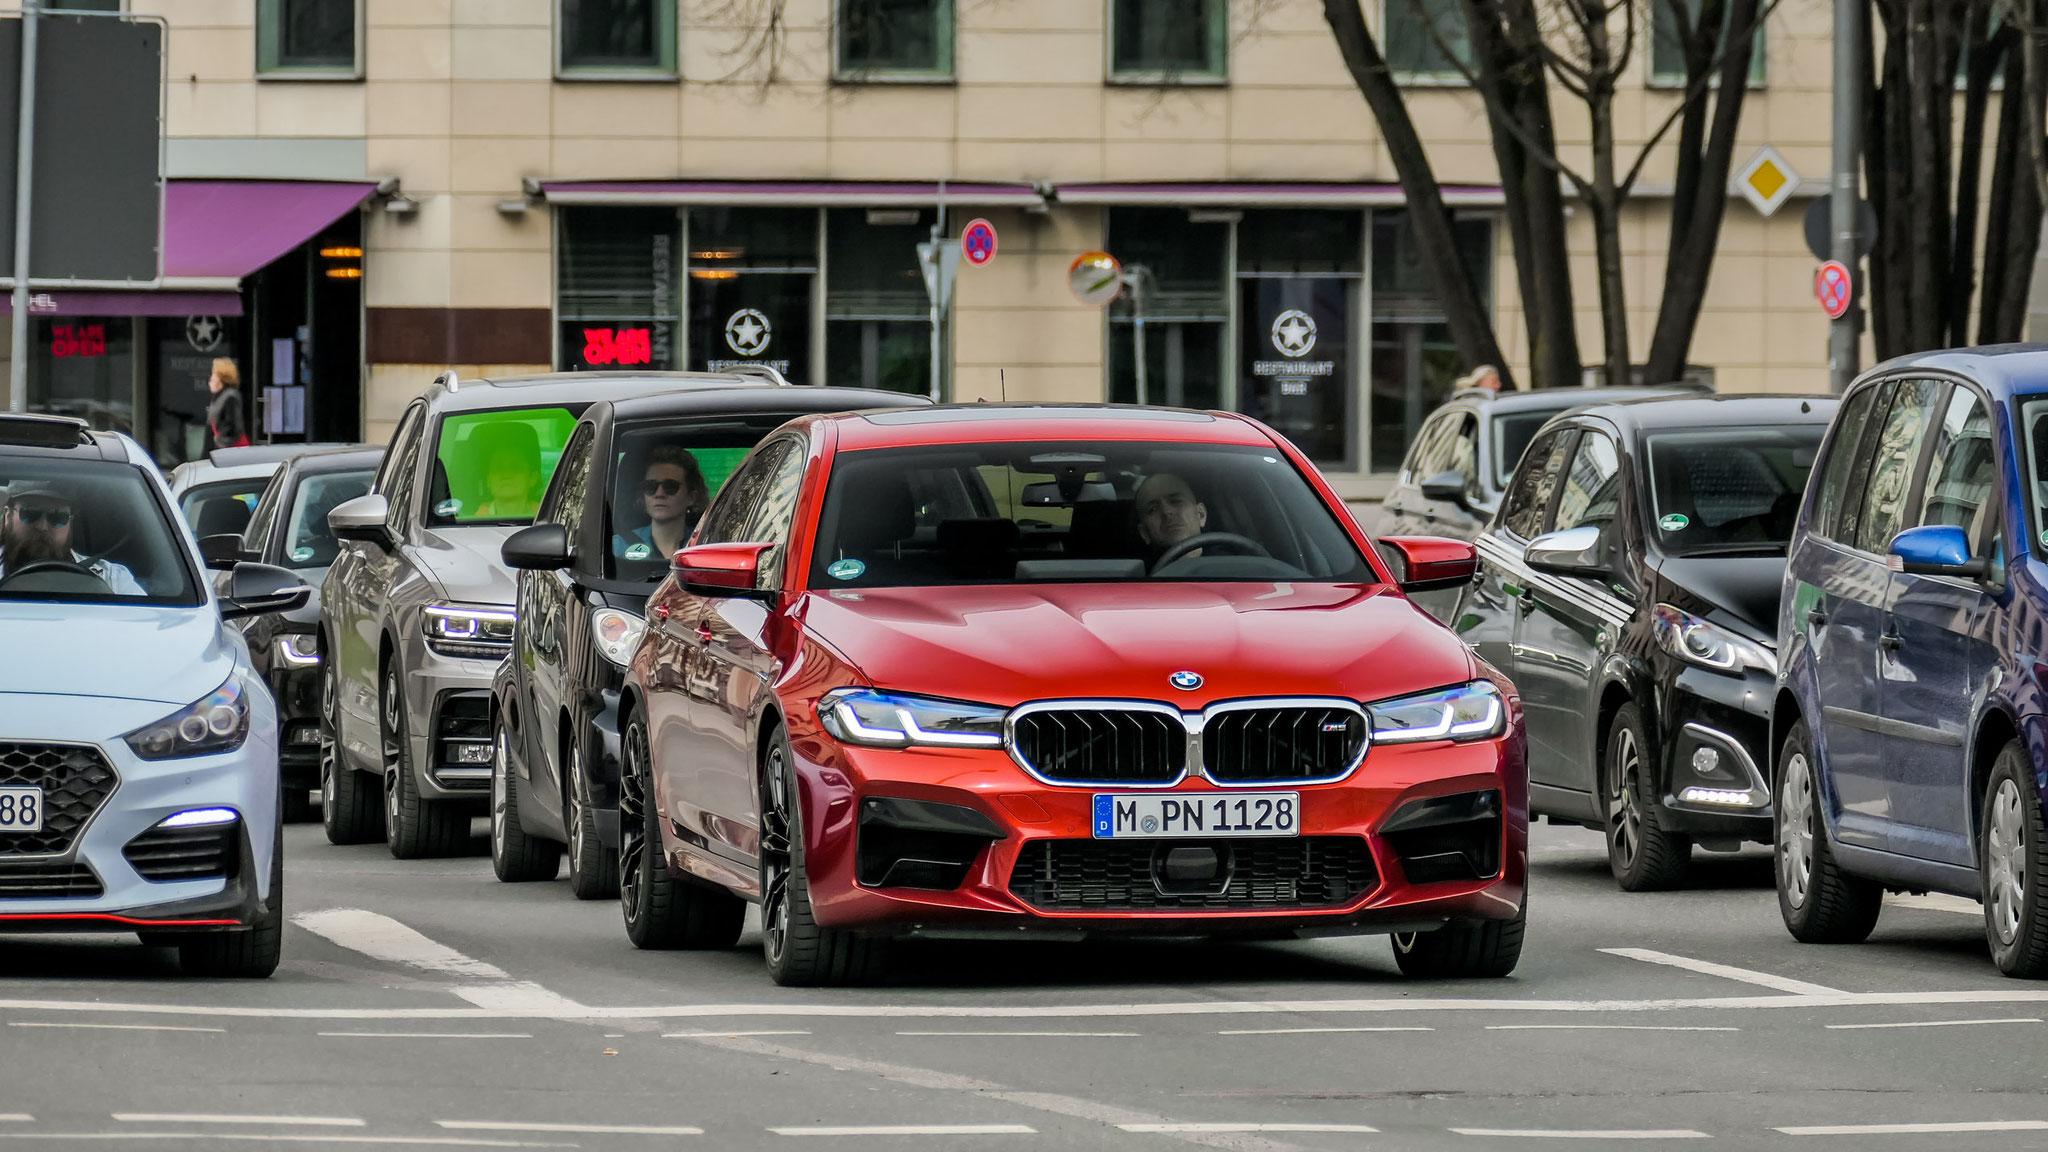 BMW M5 - M-PN-1128